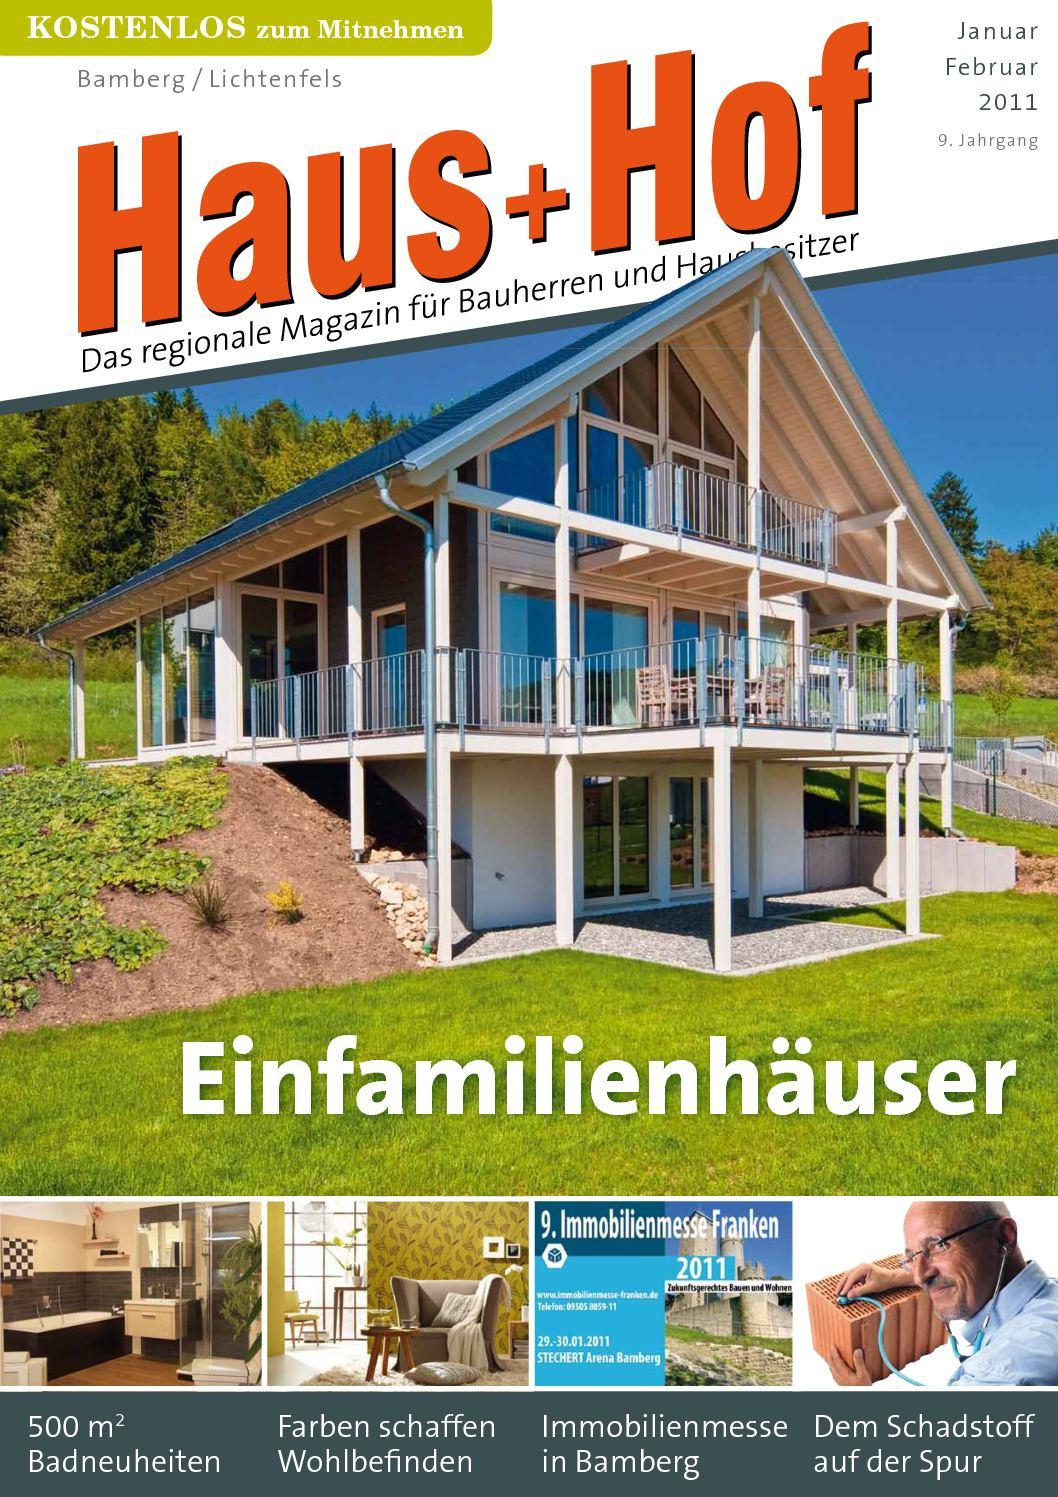 Calaméo - Haus + Hof - das regionale Baumagazin in Bamberg ...